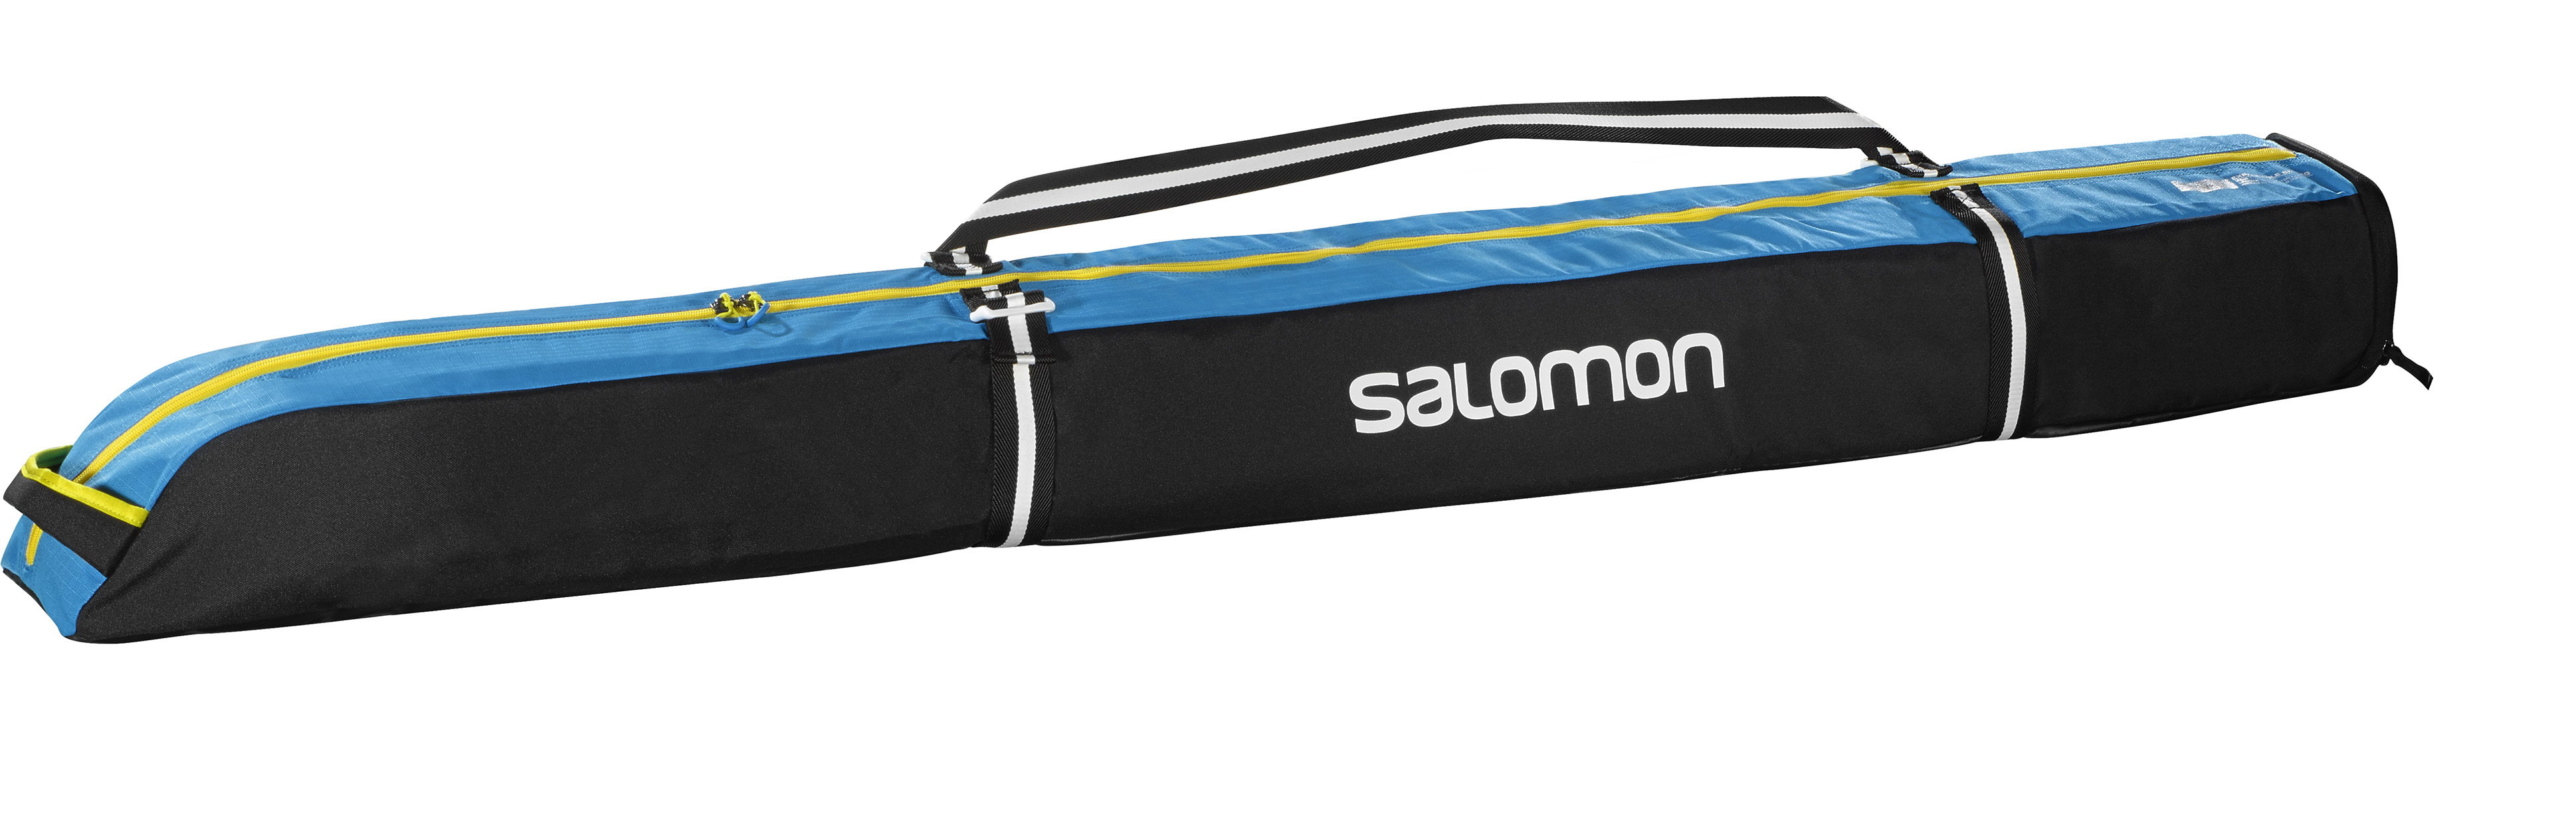 Salomon Extend 1P 165+20 Skibag 382593